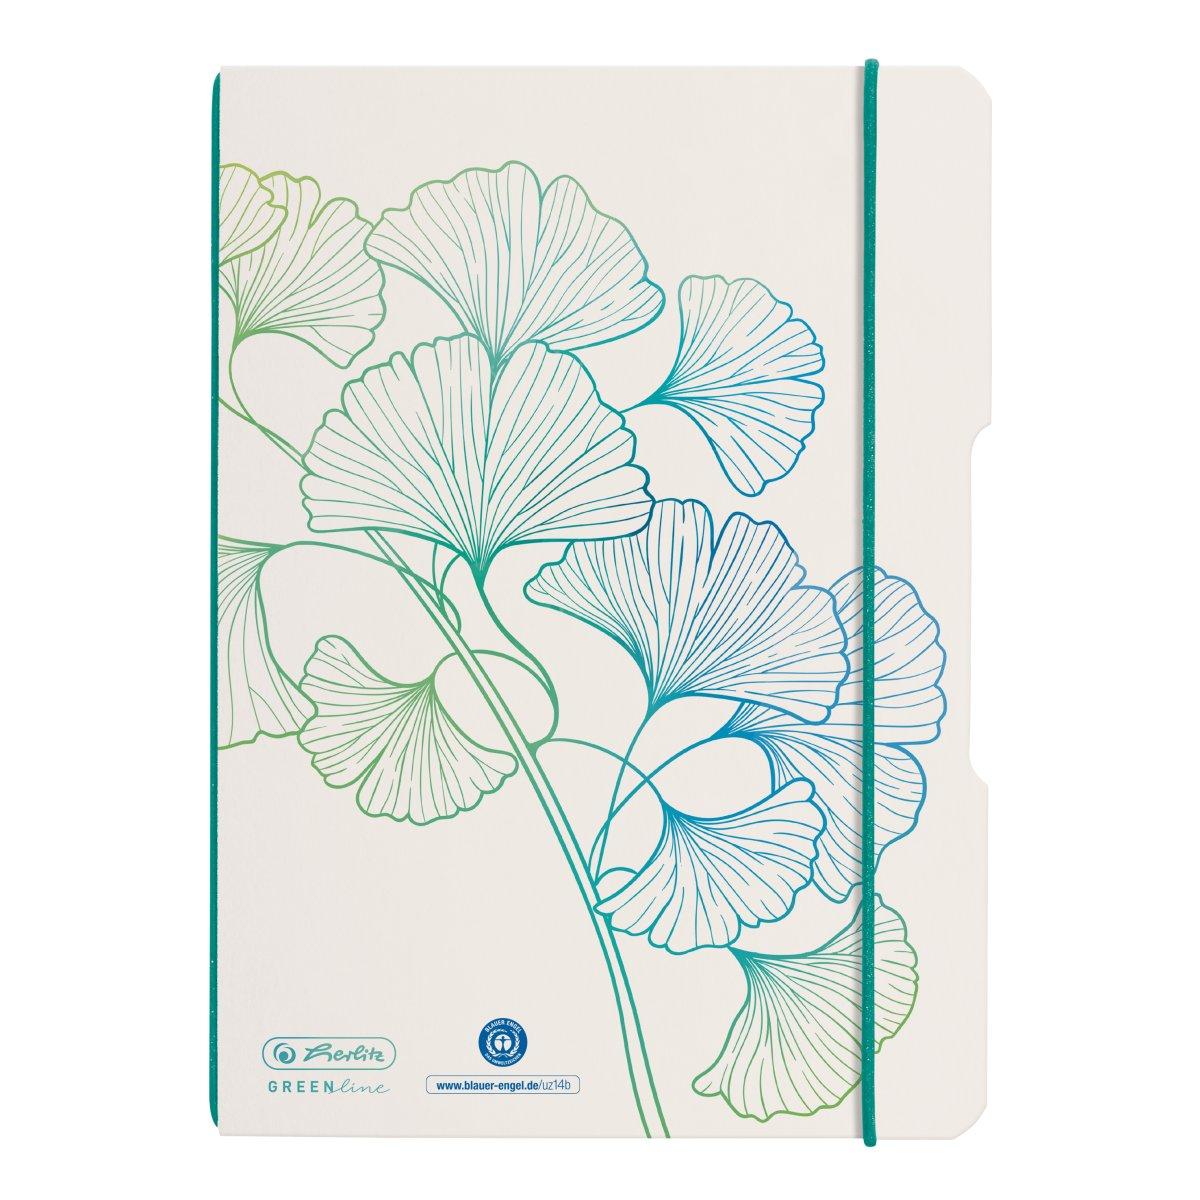 Herlitz my.book flex - Muster - Weiß - A5 - 40 Blätter - Punktgitter-Papier - Erwachsener